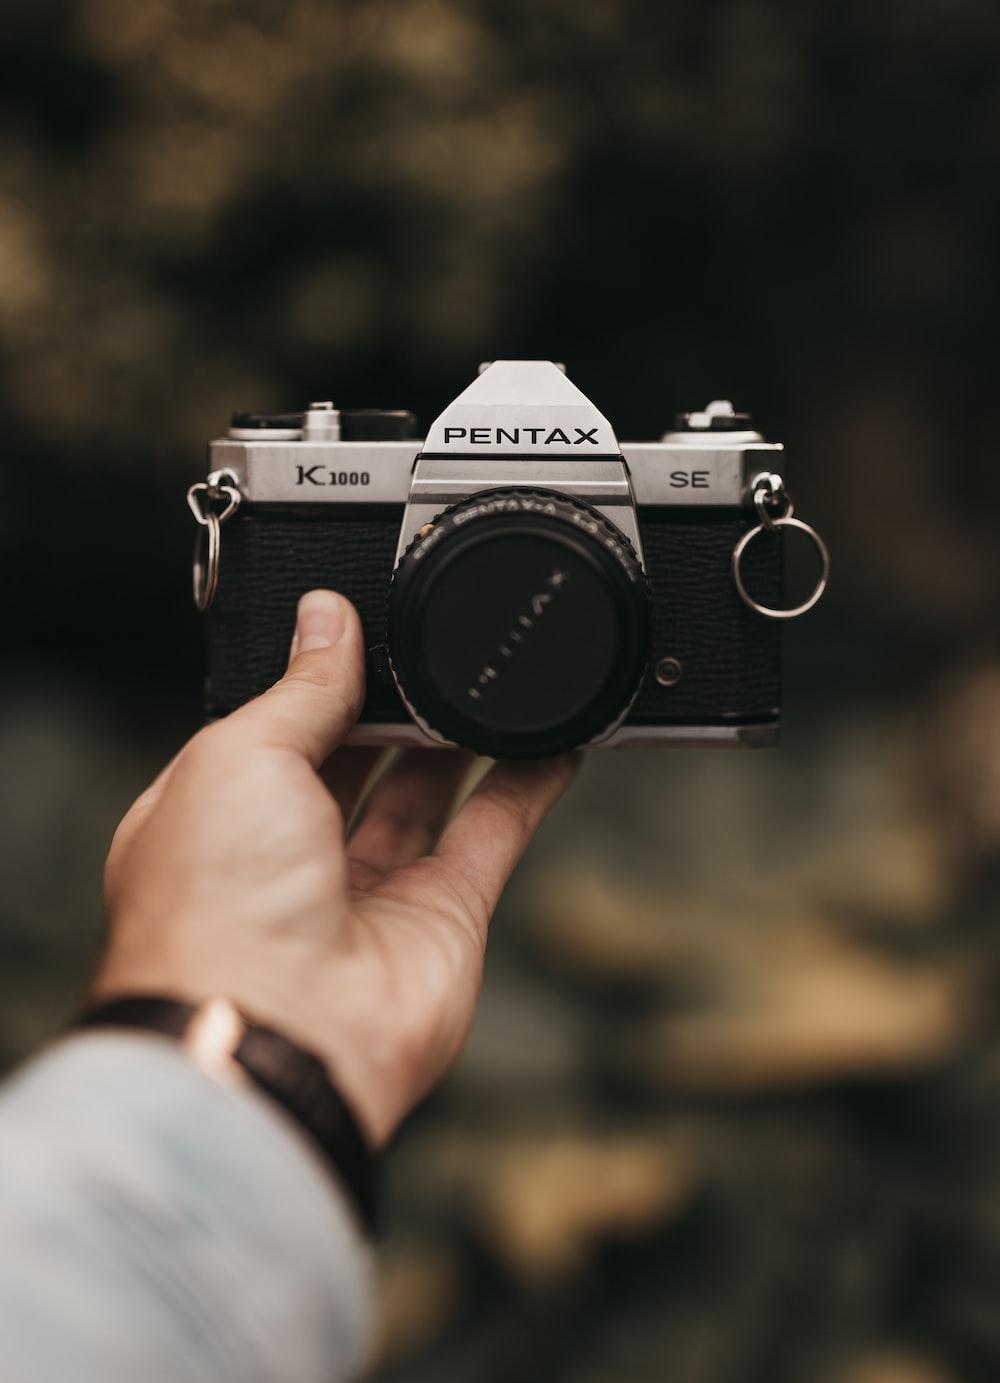 black and gray Pentax DSLR camera